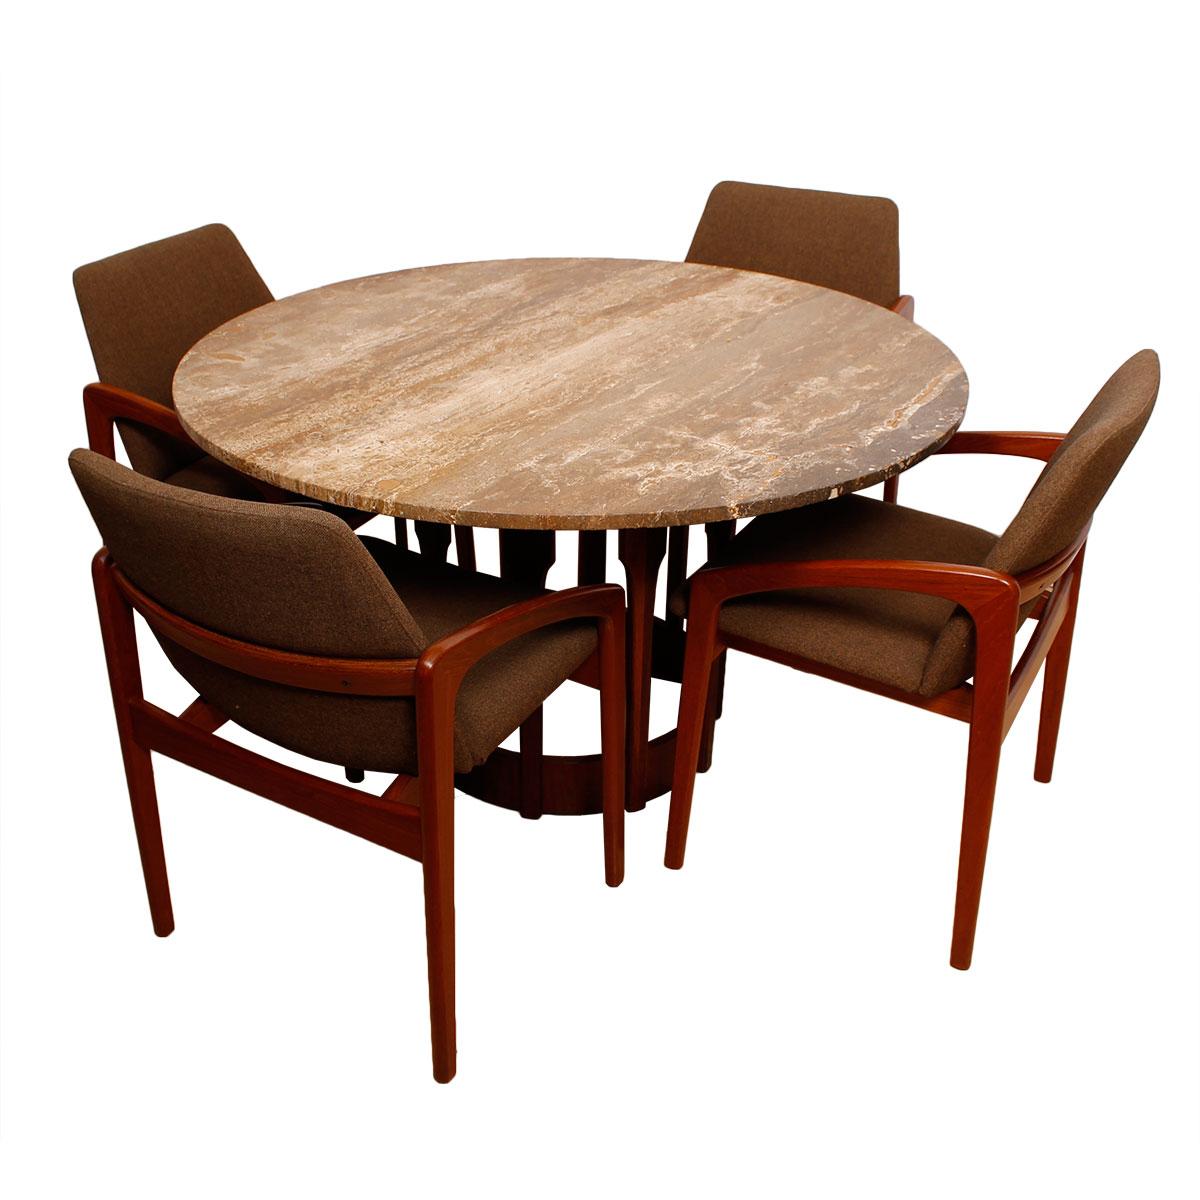 Harvey Probber Marble Top Rectangular Coffee Table W: Modern Mobler